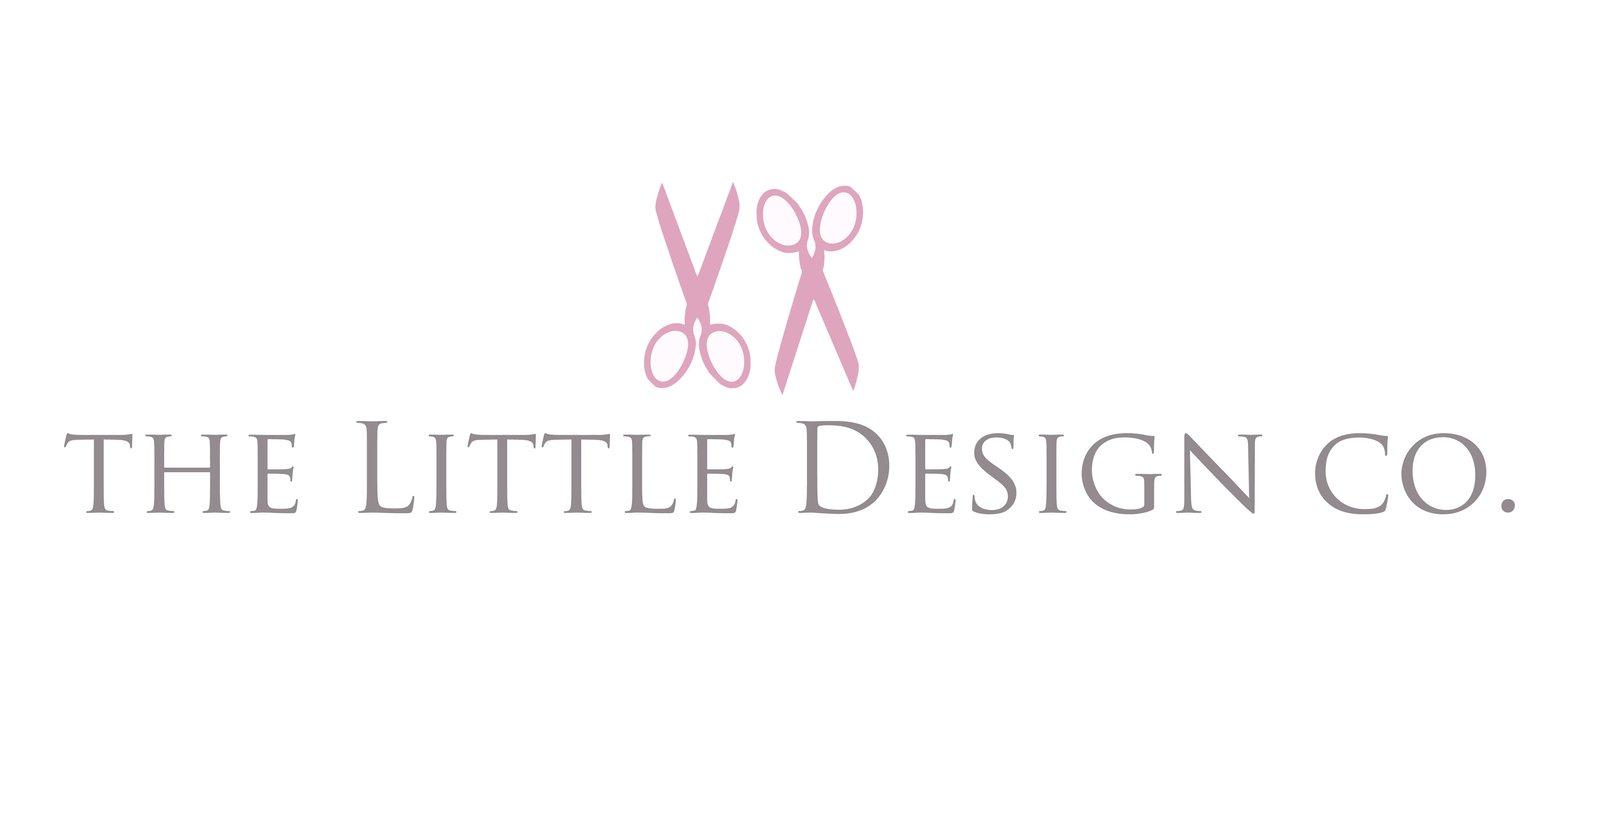 The Little Design Co